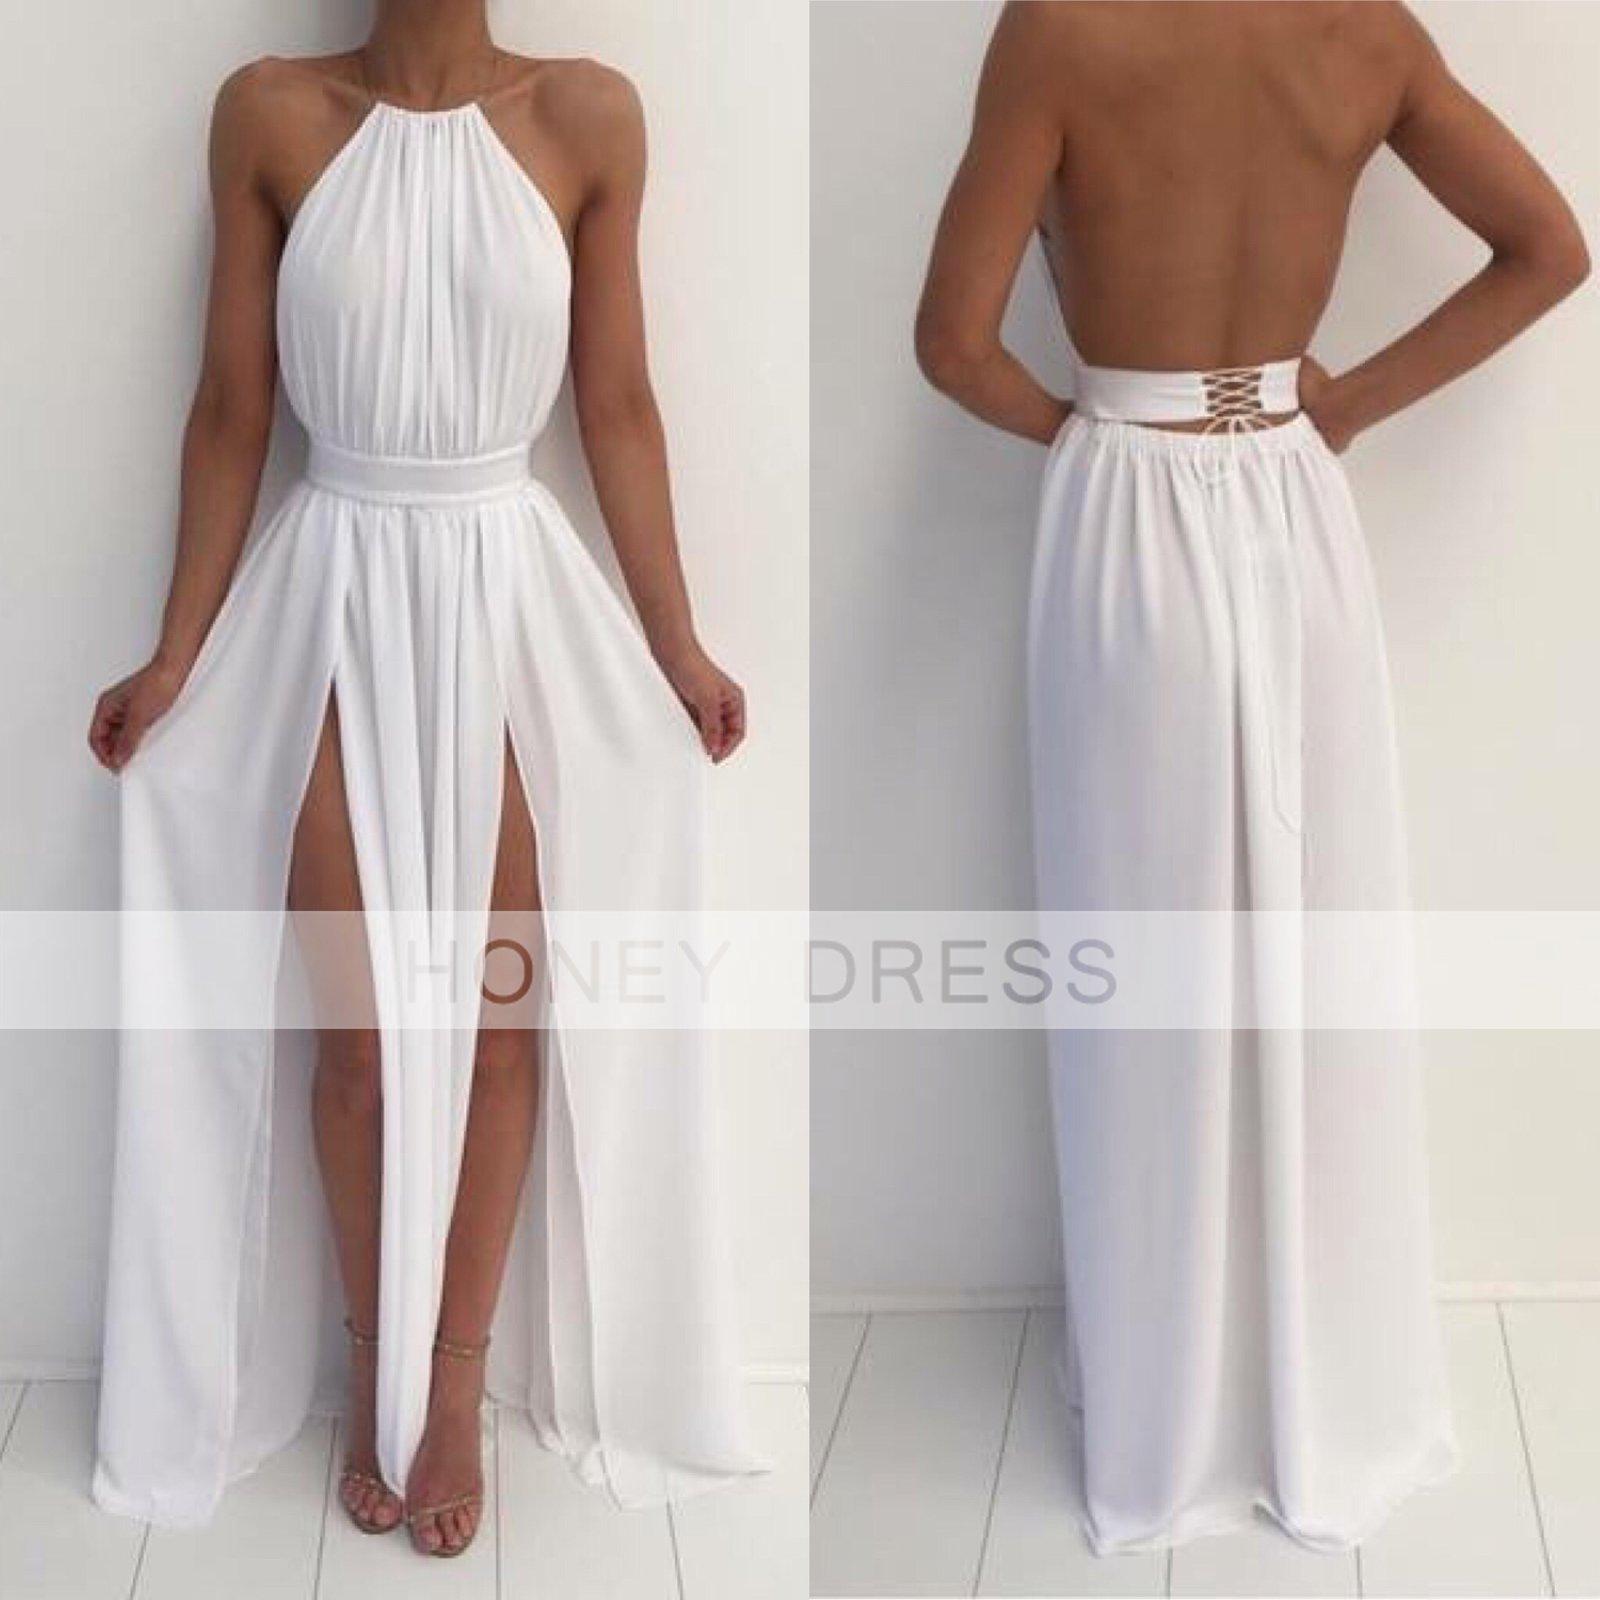 Honey Dress White Chiffon Nude Halter Slit Open Back Prom Dress